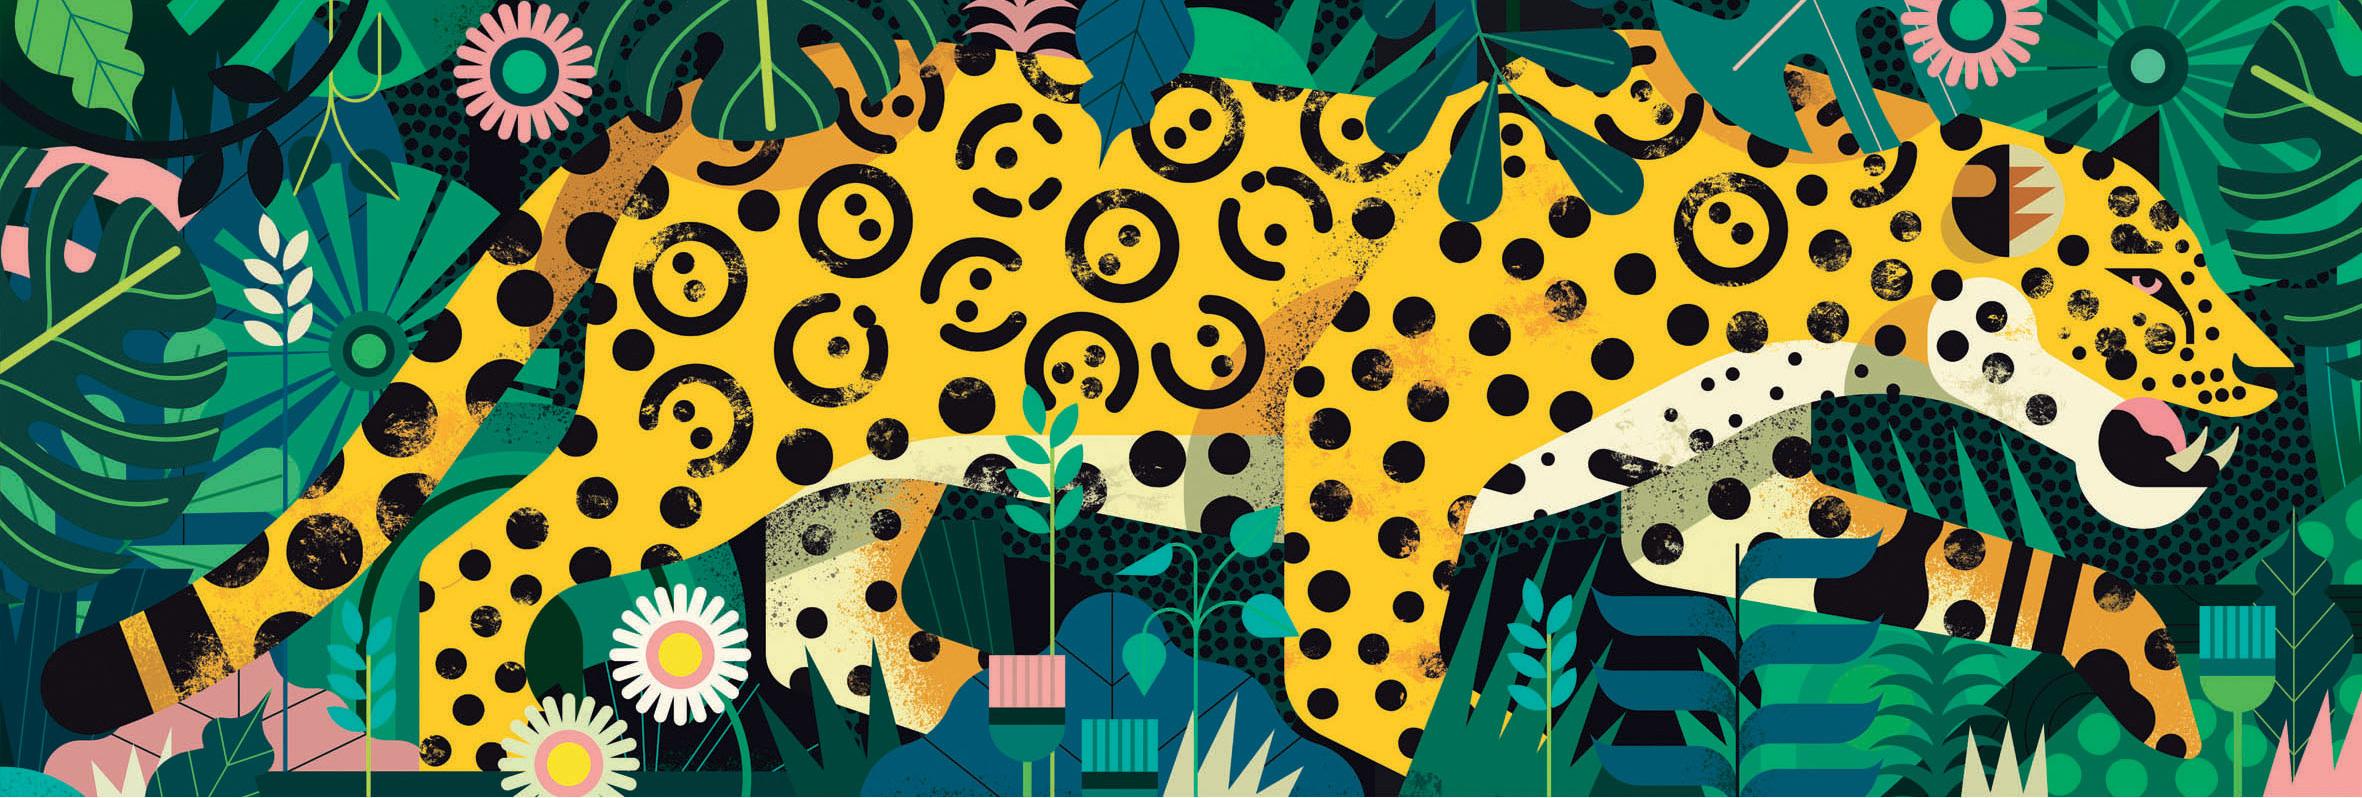 Leopard Jungle Animals Jigsaw Puzzle